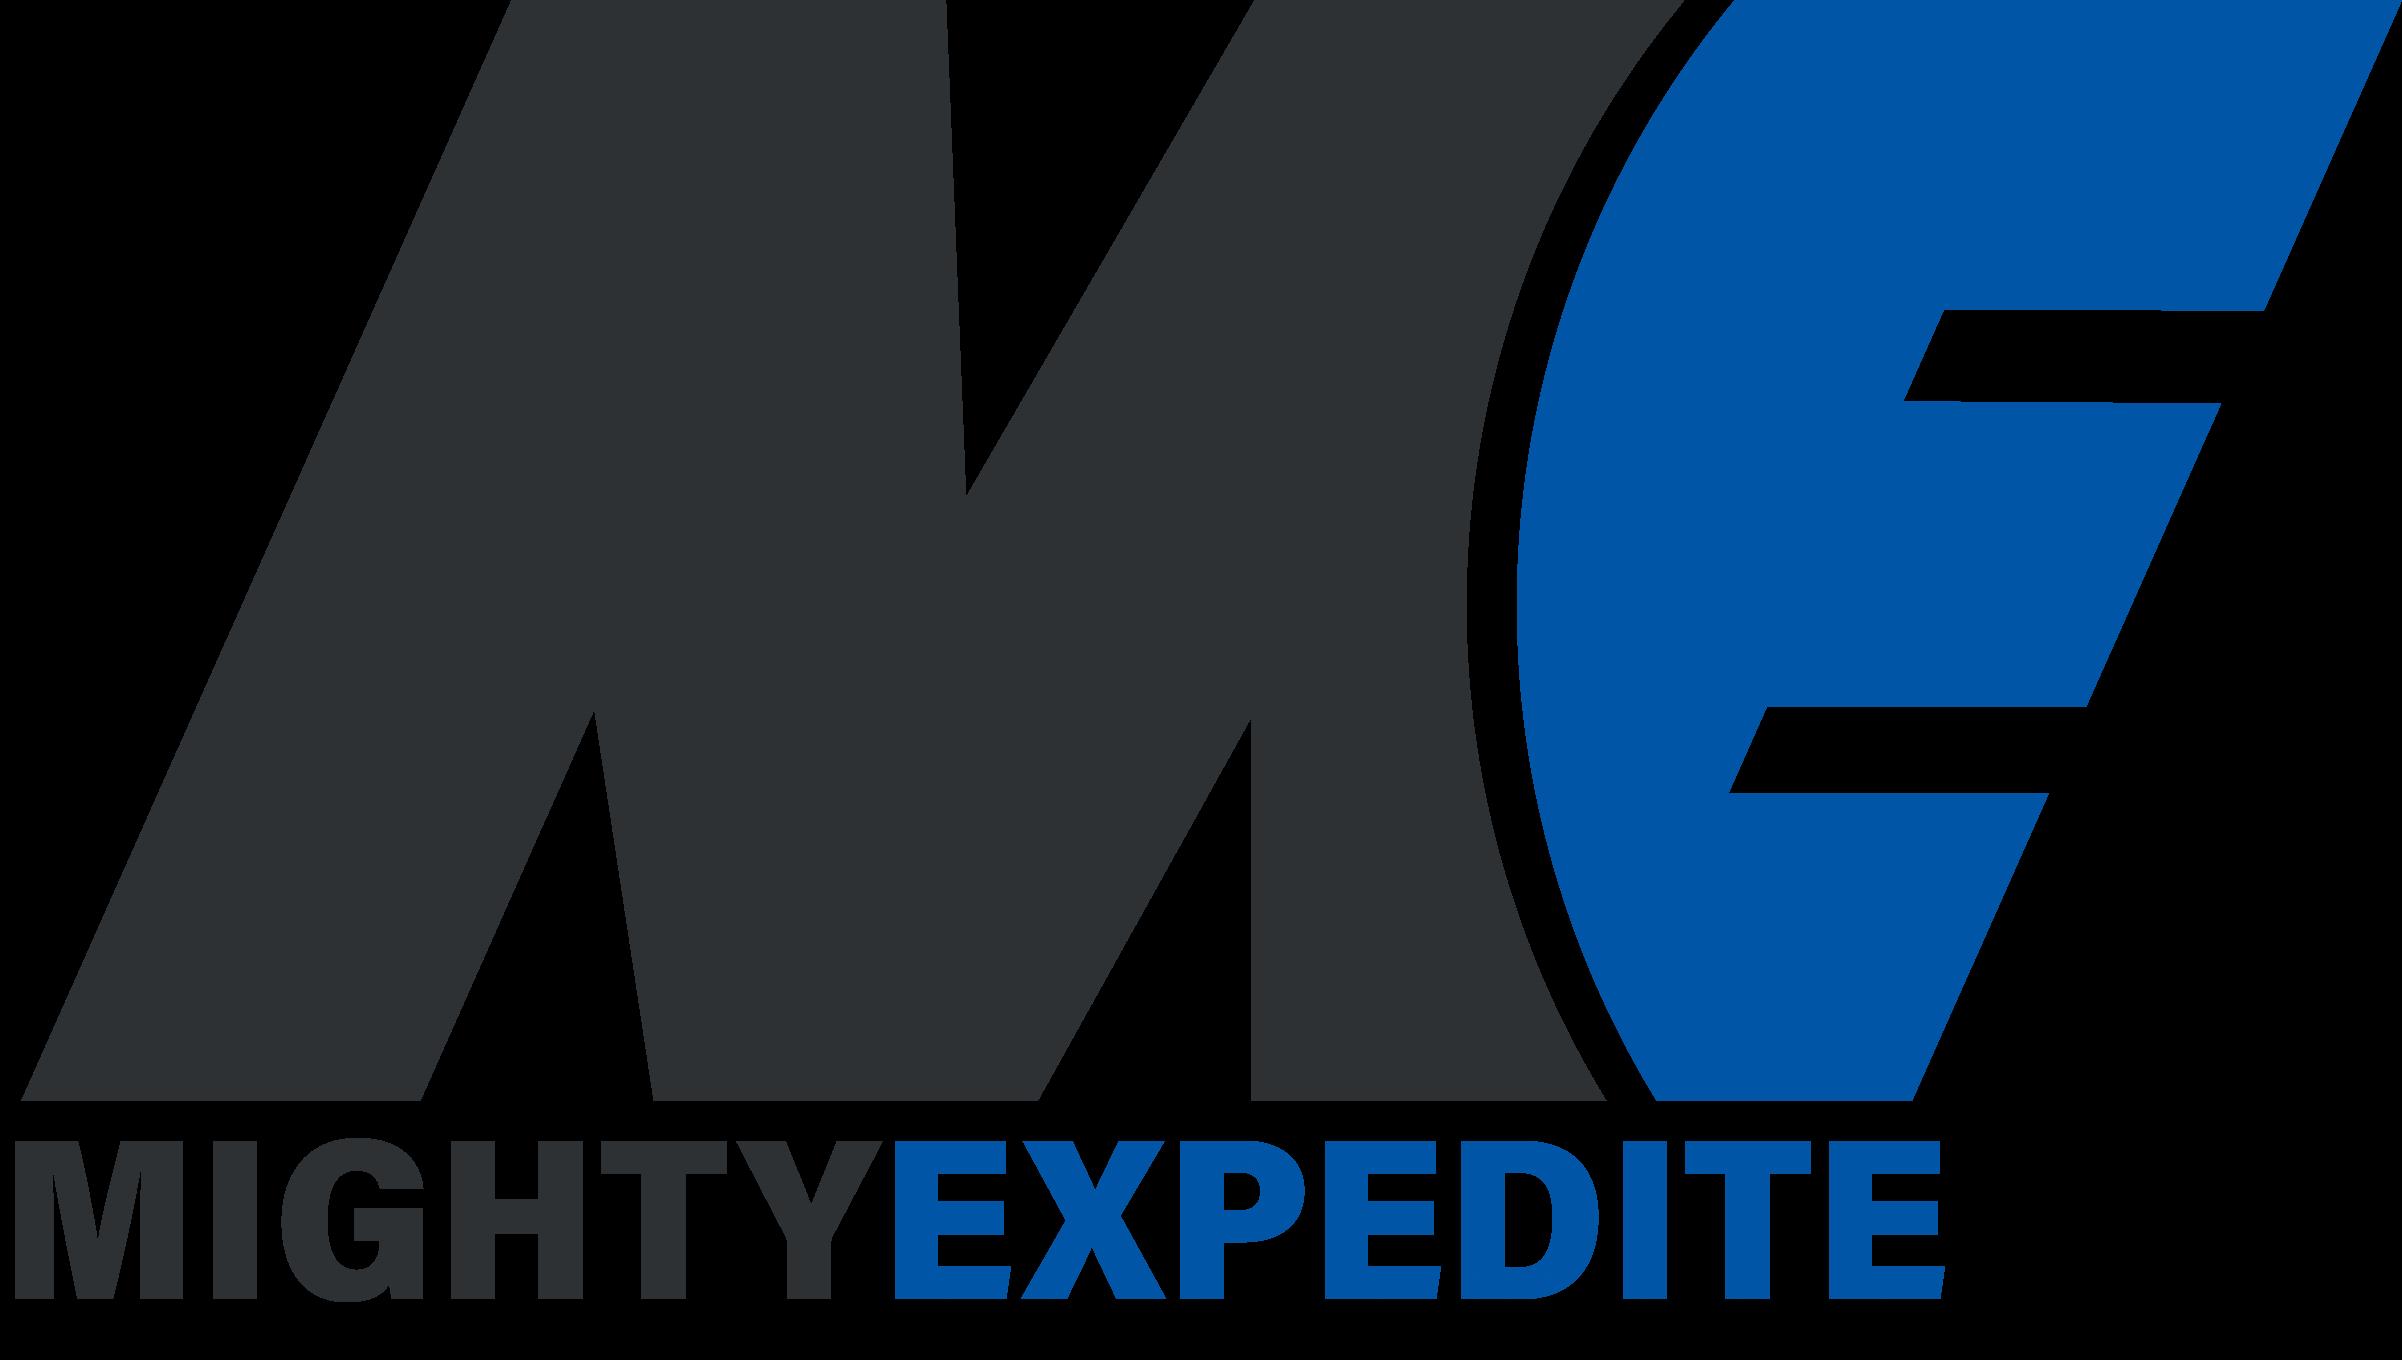 Mighty Expedite